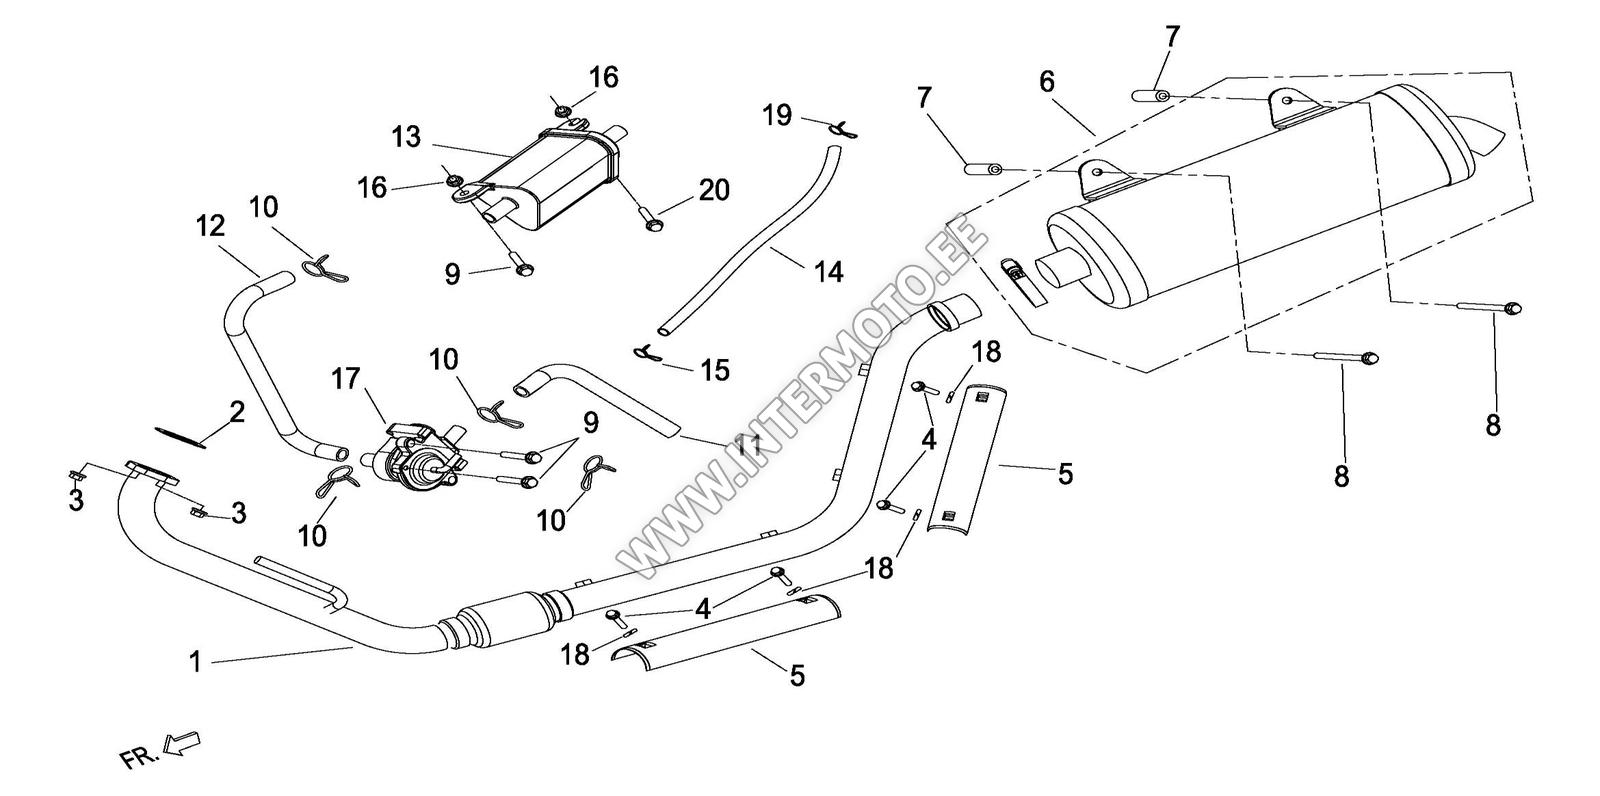 Kazuma 110cc Dirt Bike Wiring Diagram. Kazuma 150 Wiring ... on